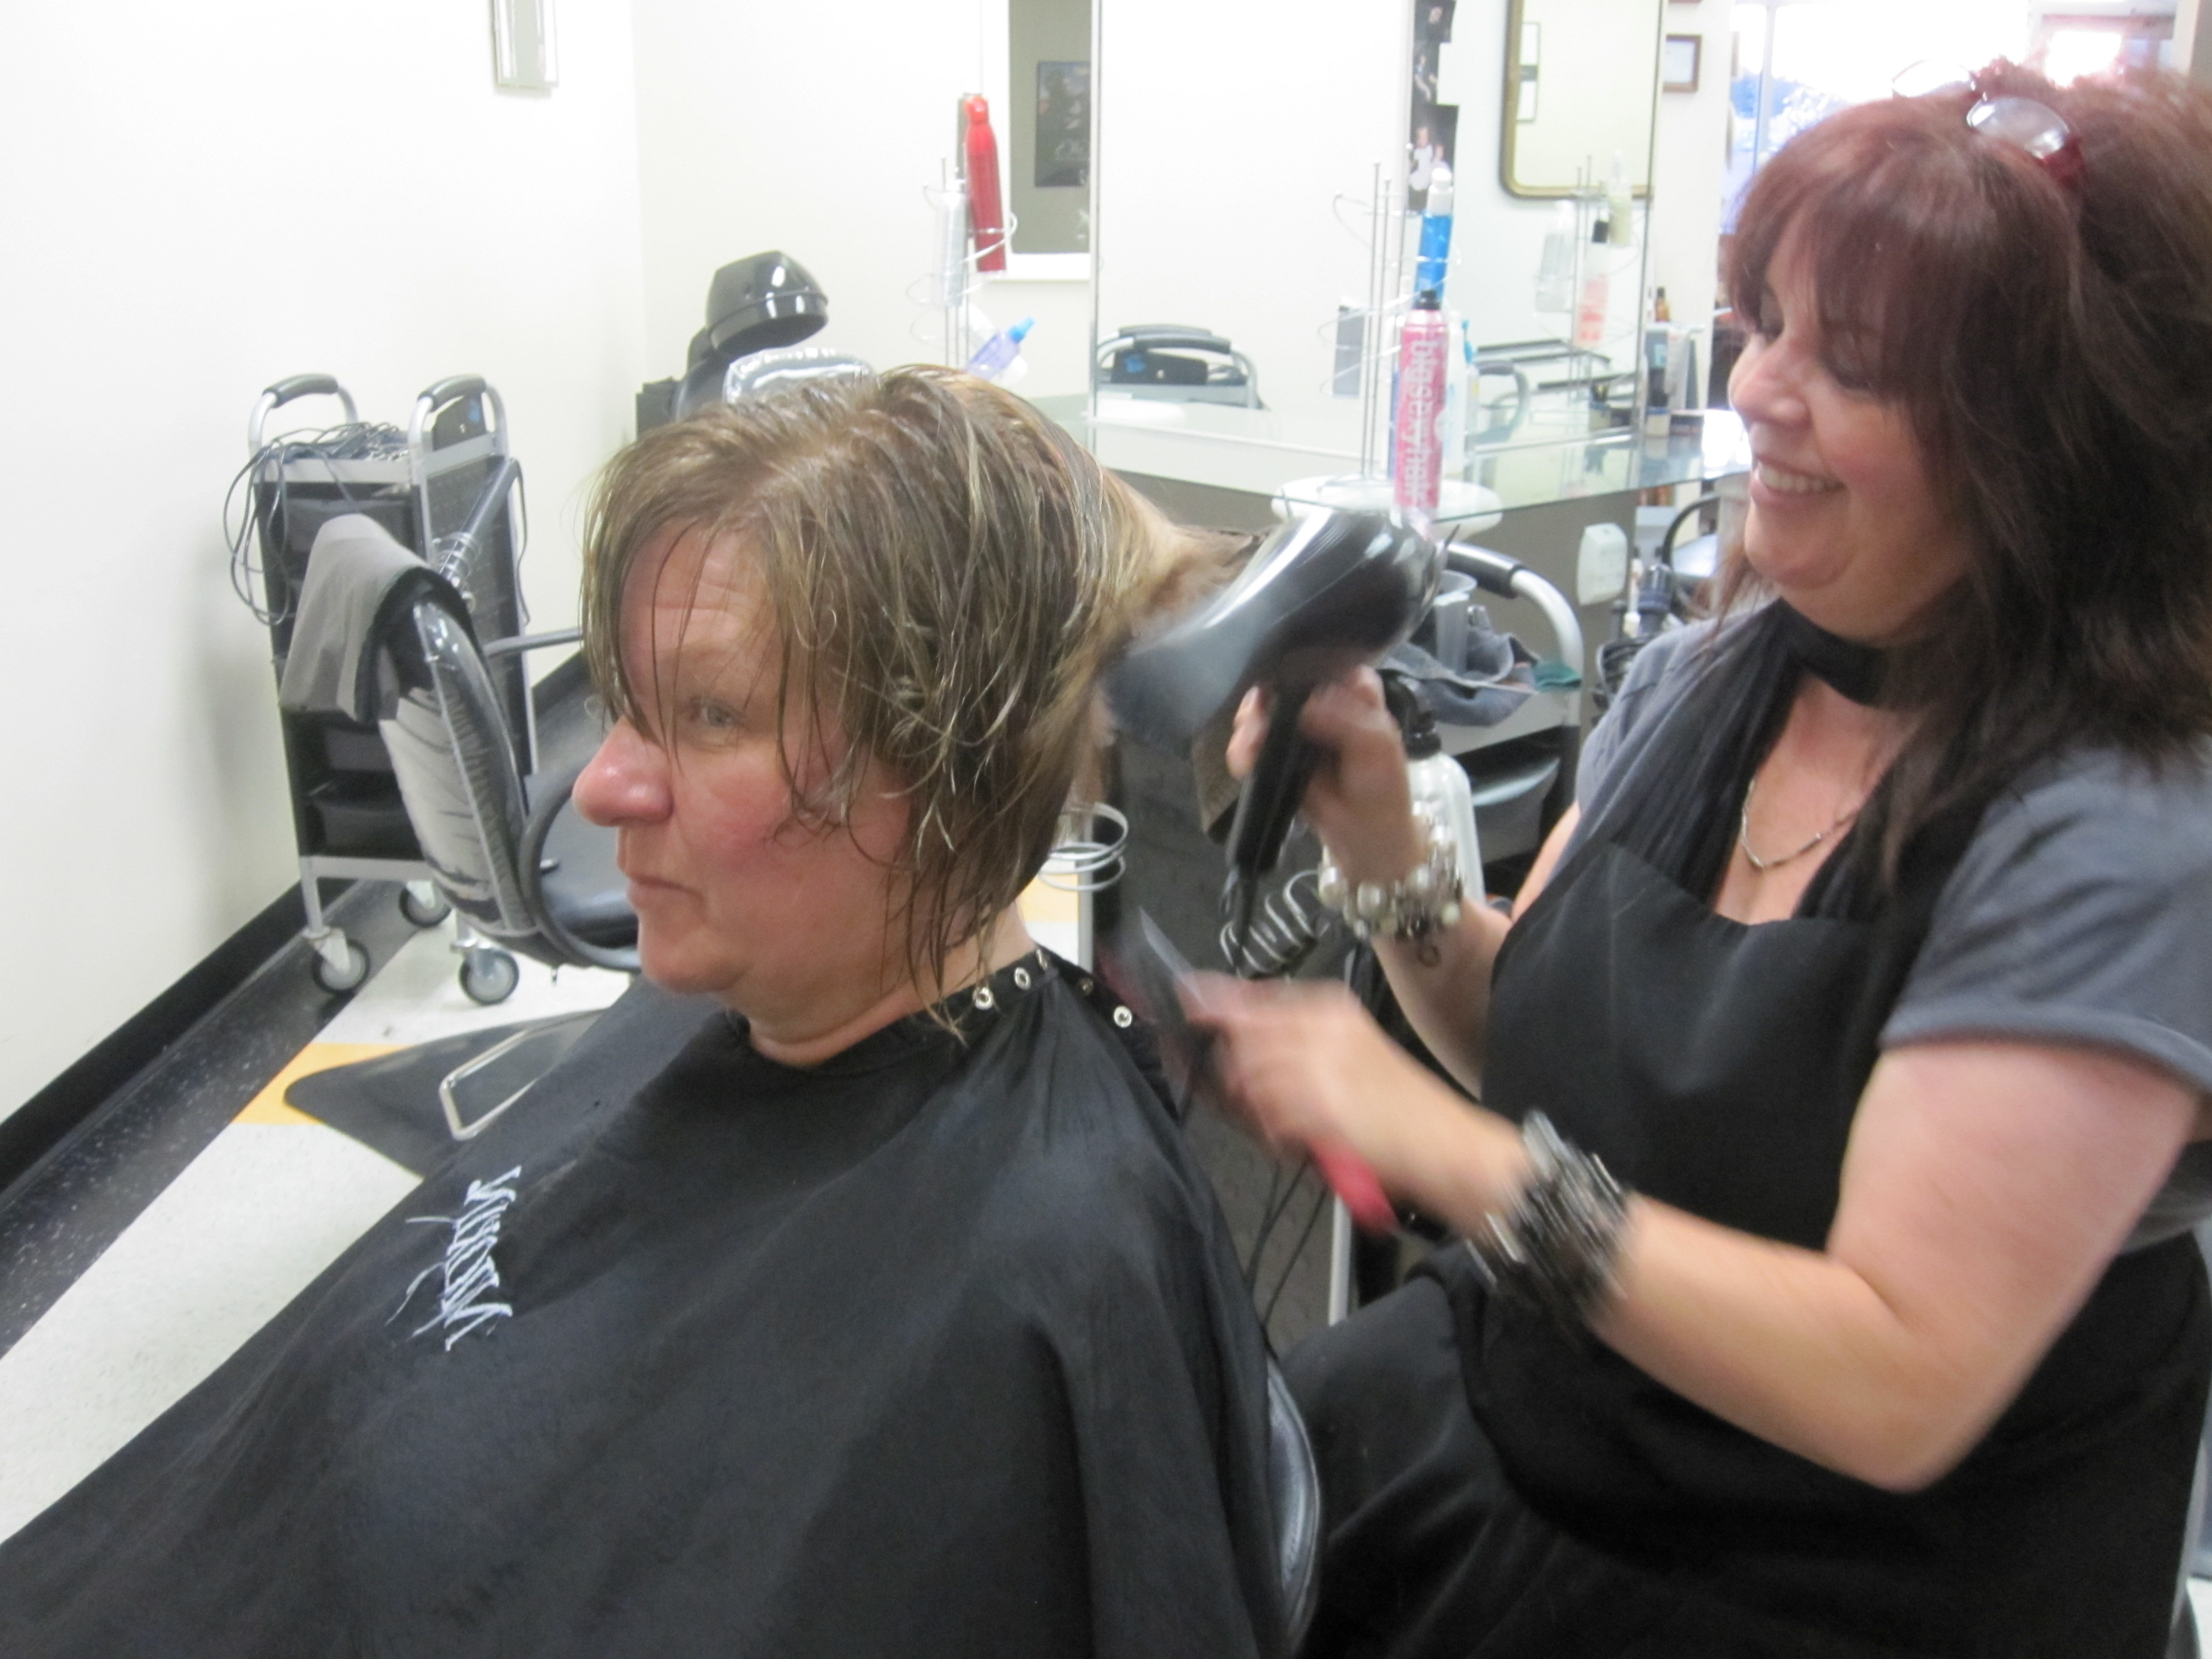 Hair Cut Imperfect Lady